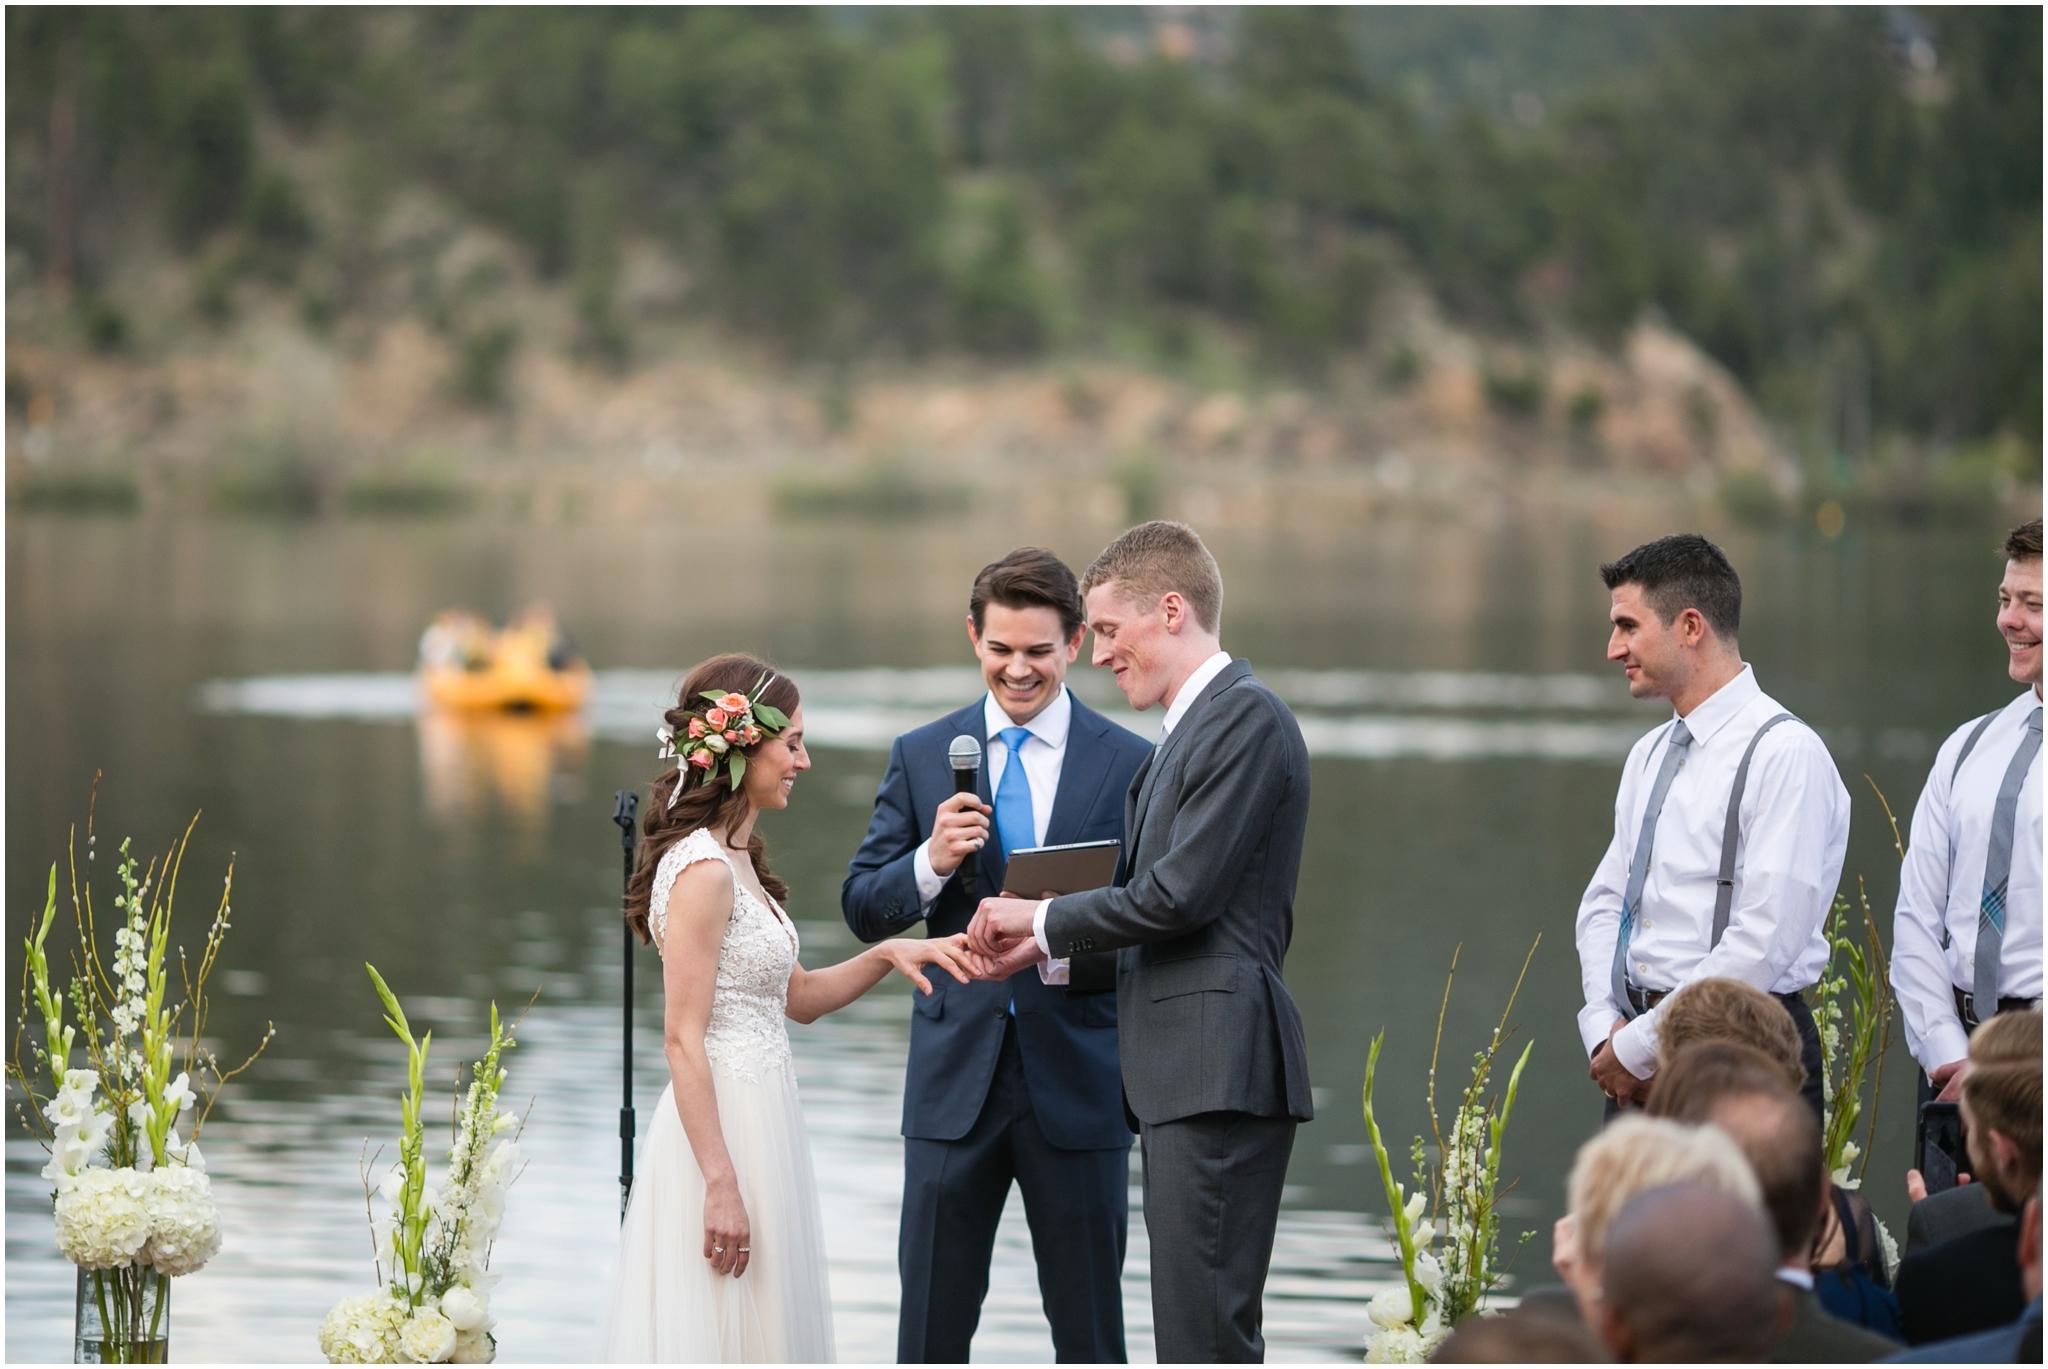 Evergreen_Lake_house_Wedding_Photographers_ceremony.JPG